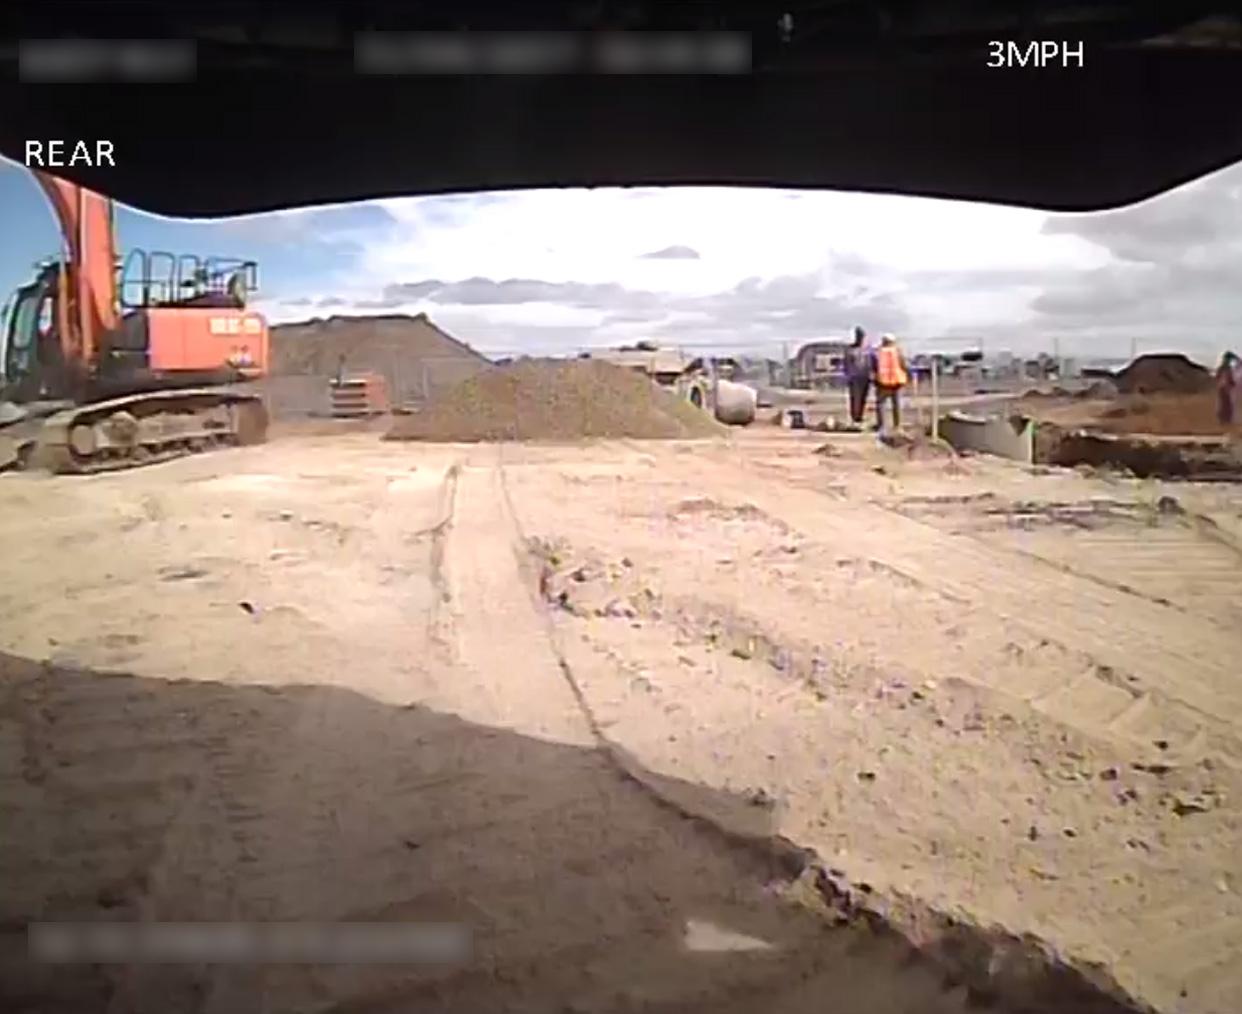 Rear Camera View